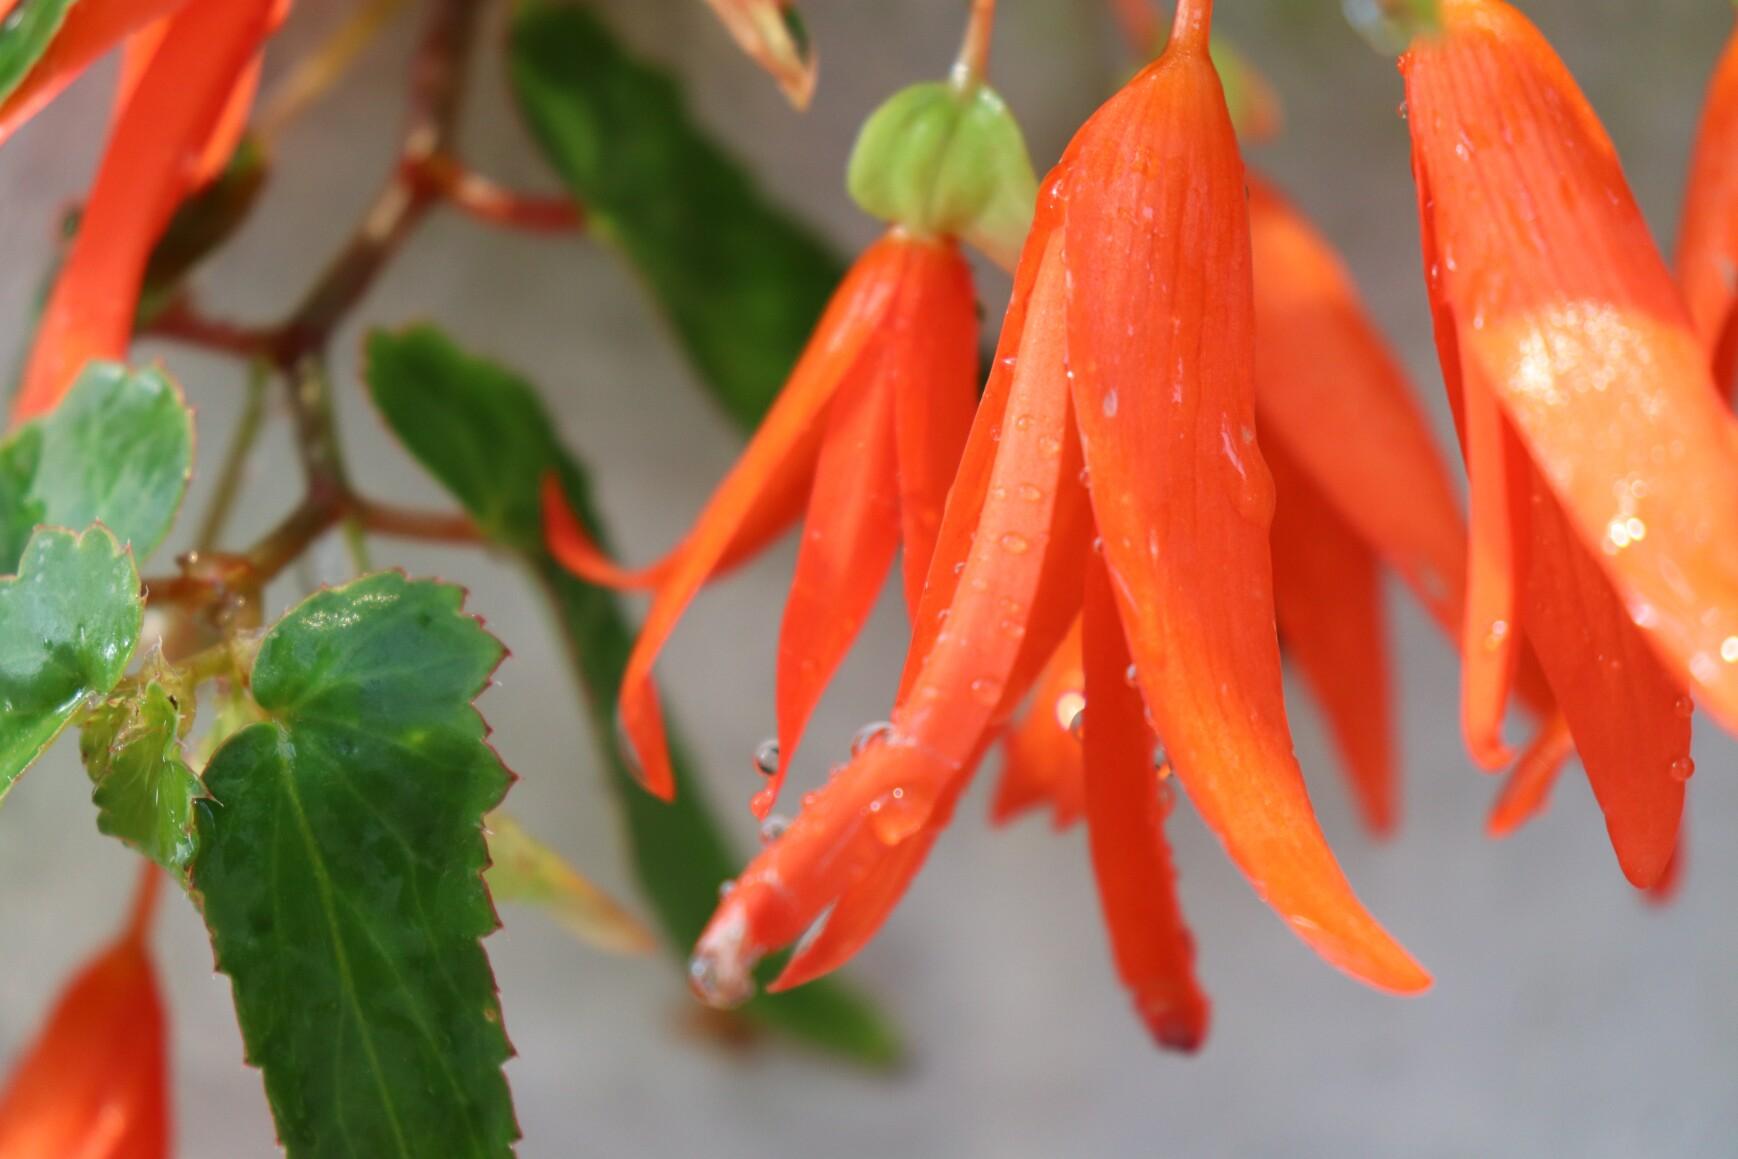 Begonia bolivensis